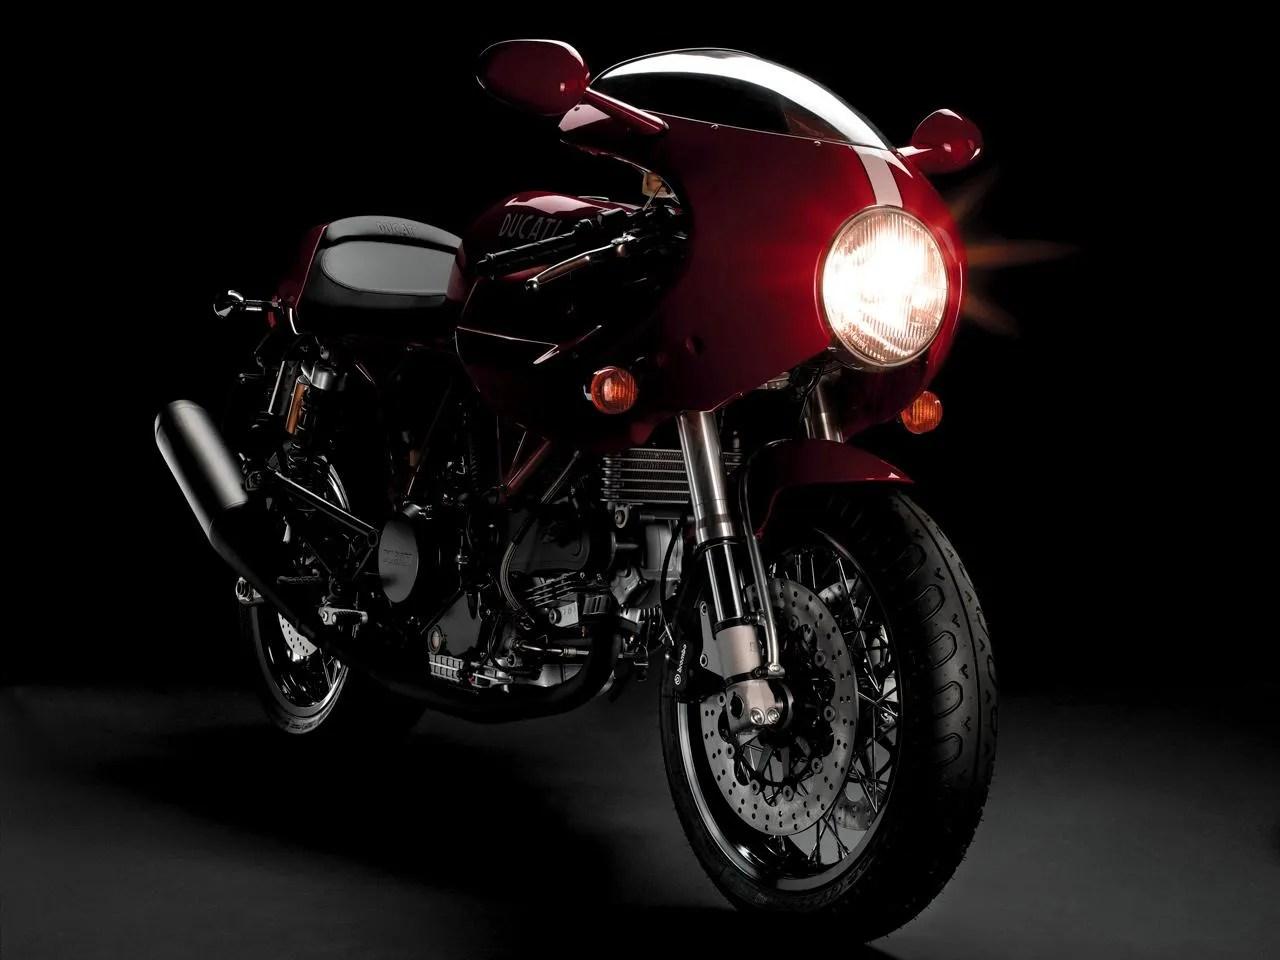 2009 Ducati SportClassic Sport 1000 S   Top Speed